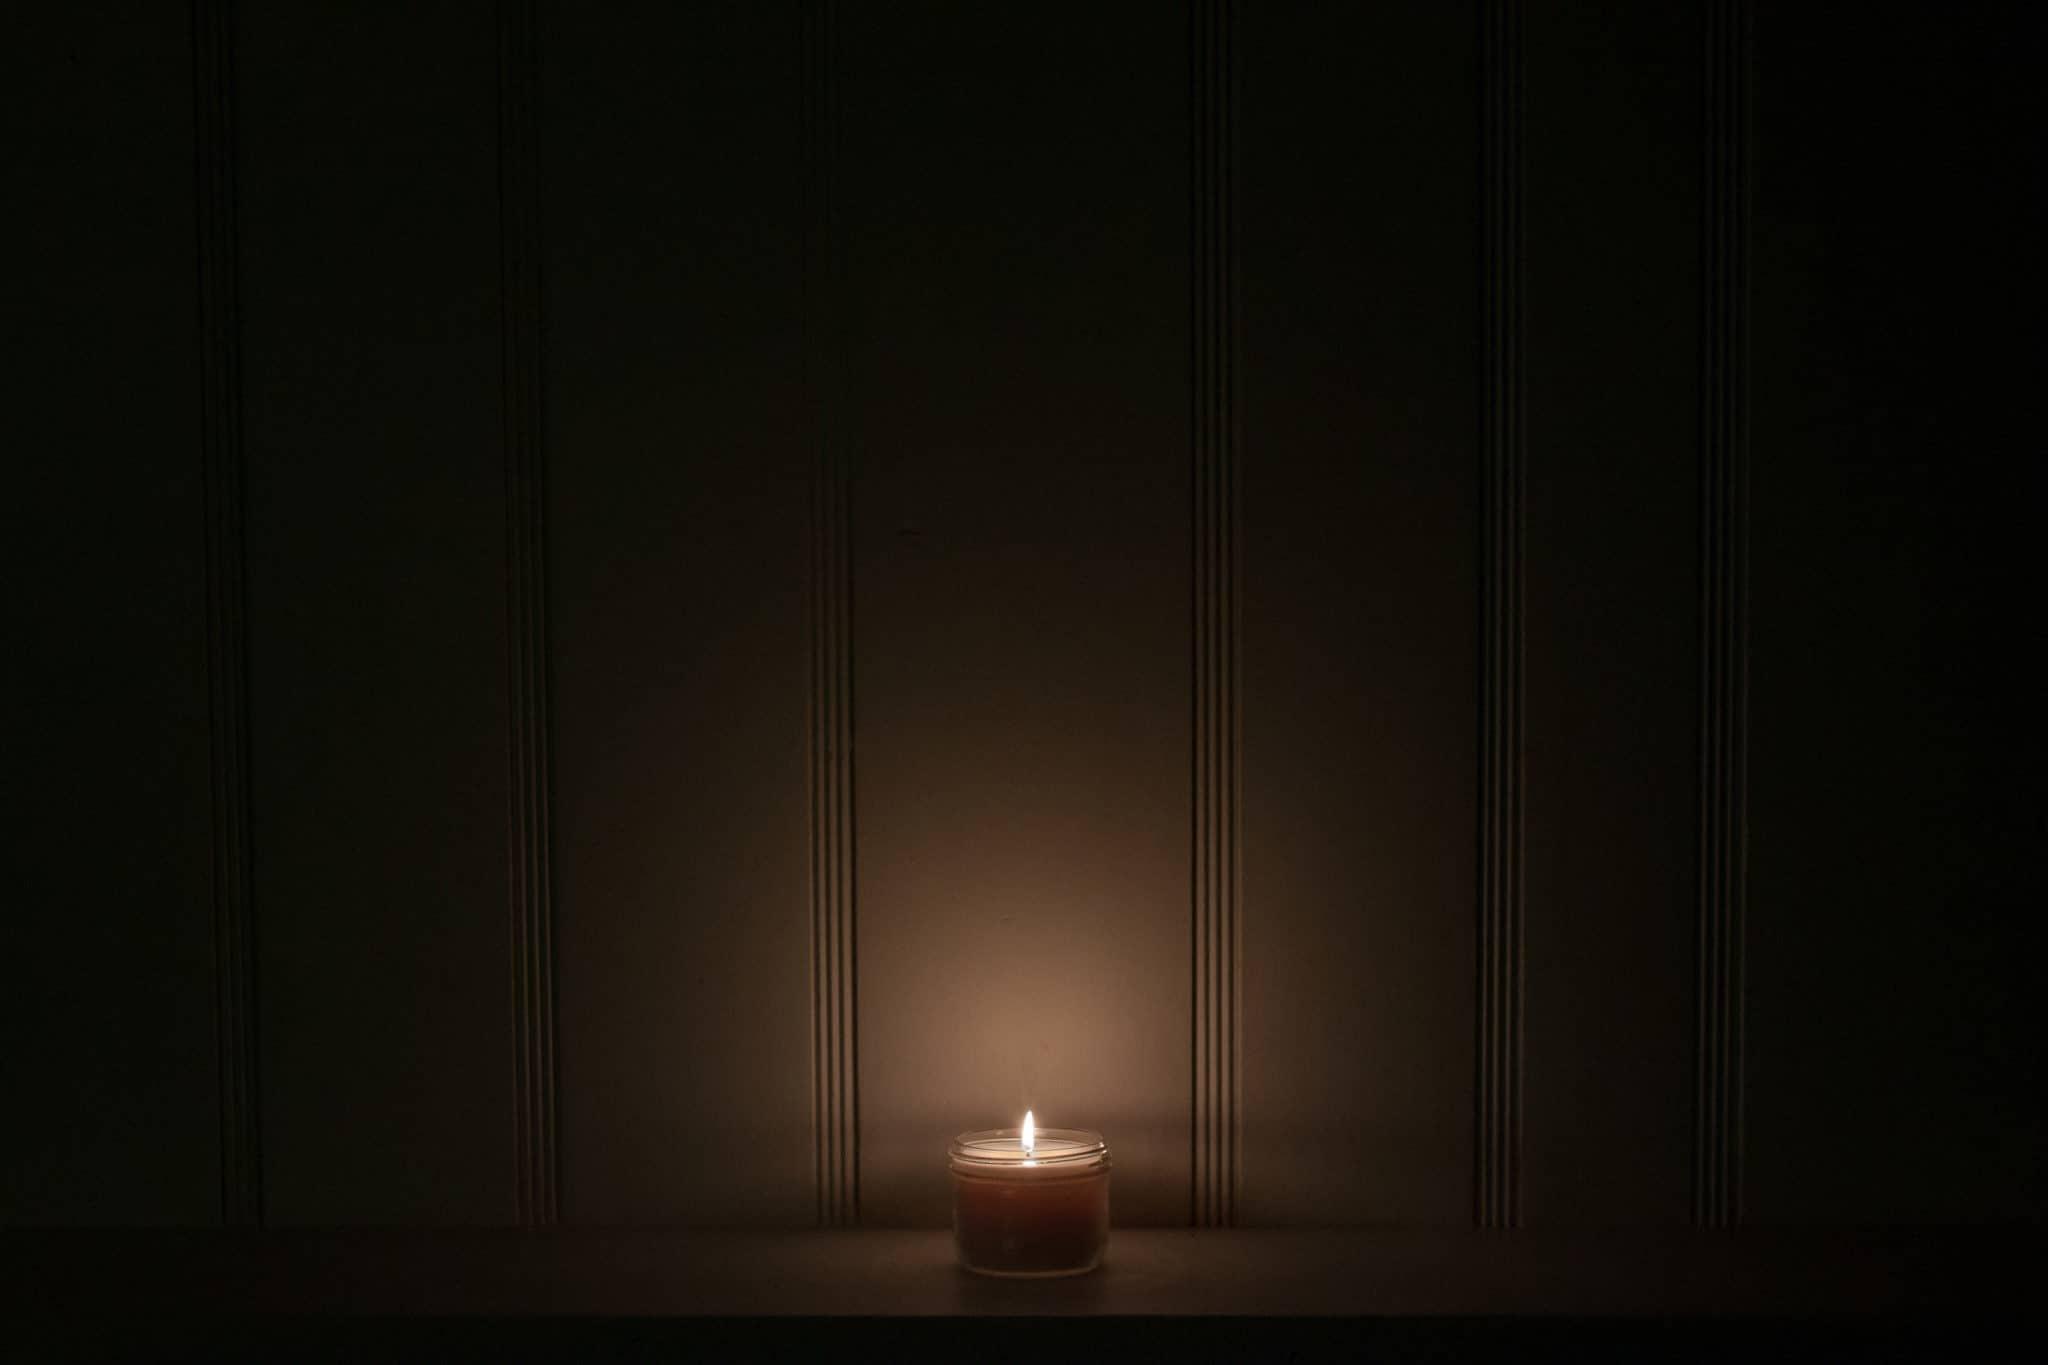 Single Illuminating Flame